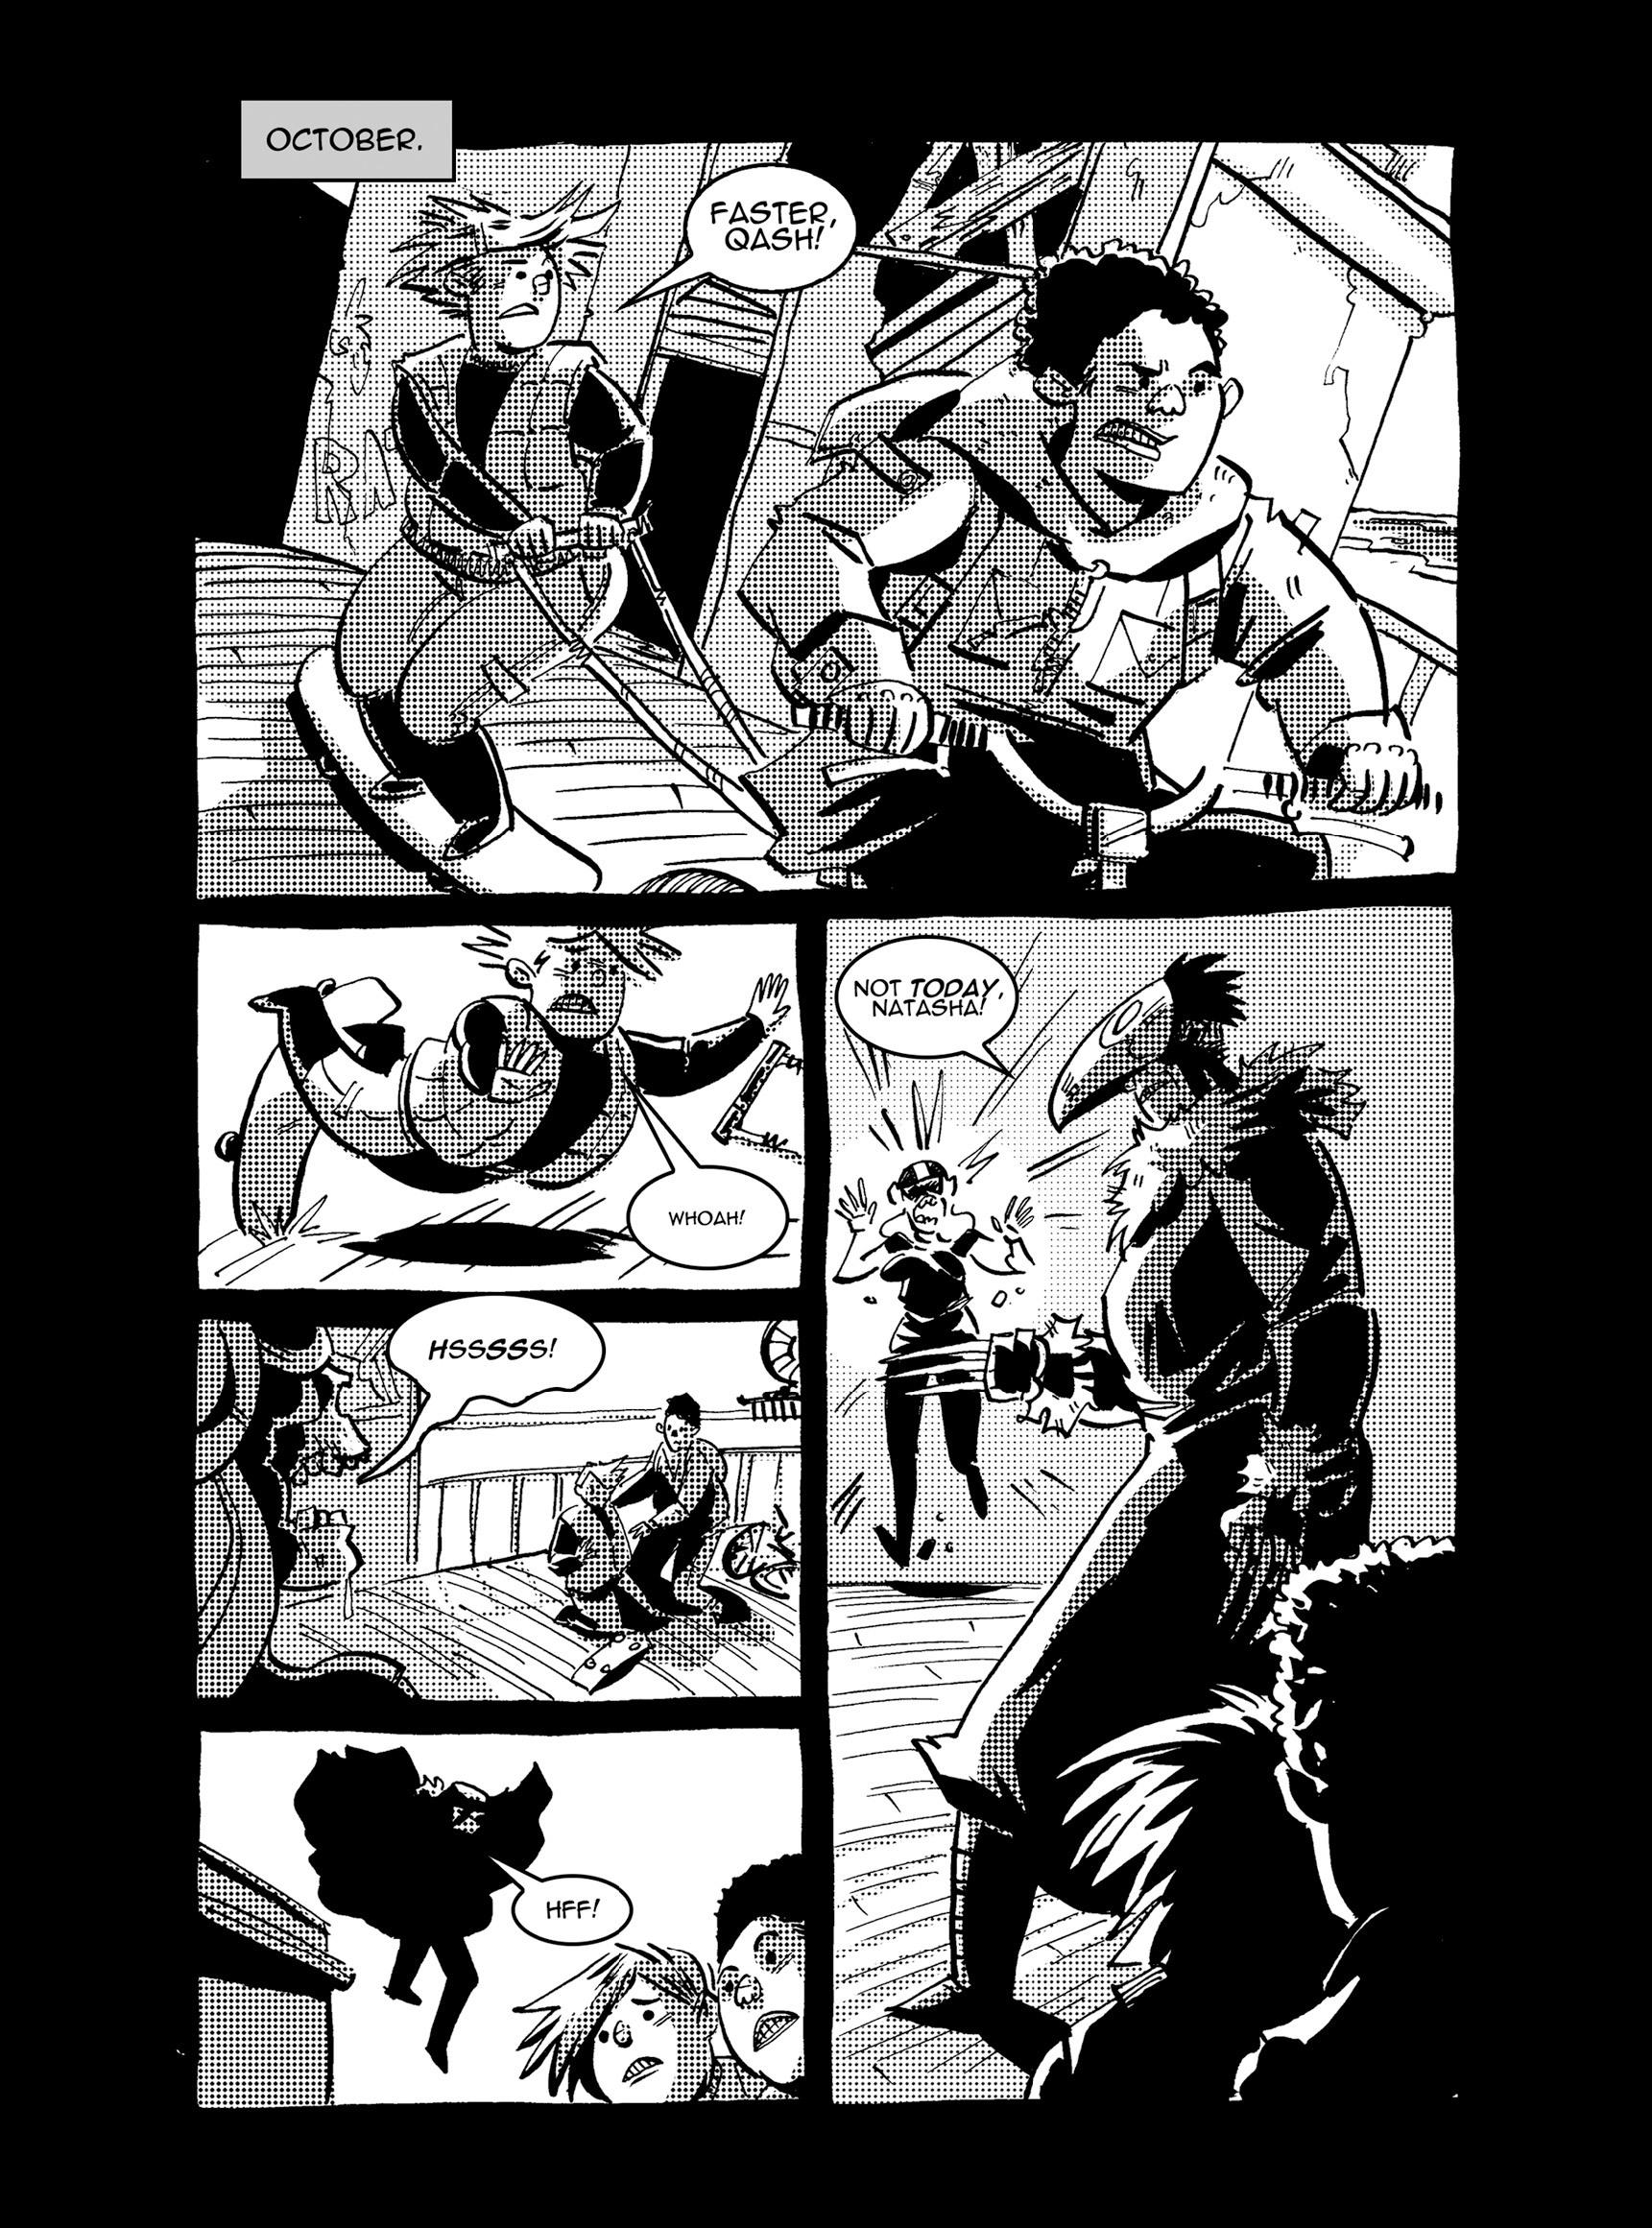 Read online FUBAR comic -  Issue #3 - 362